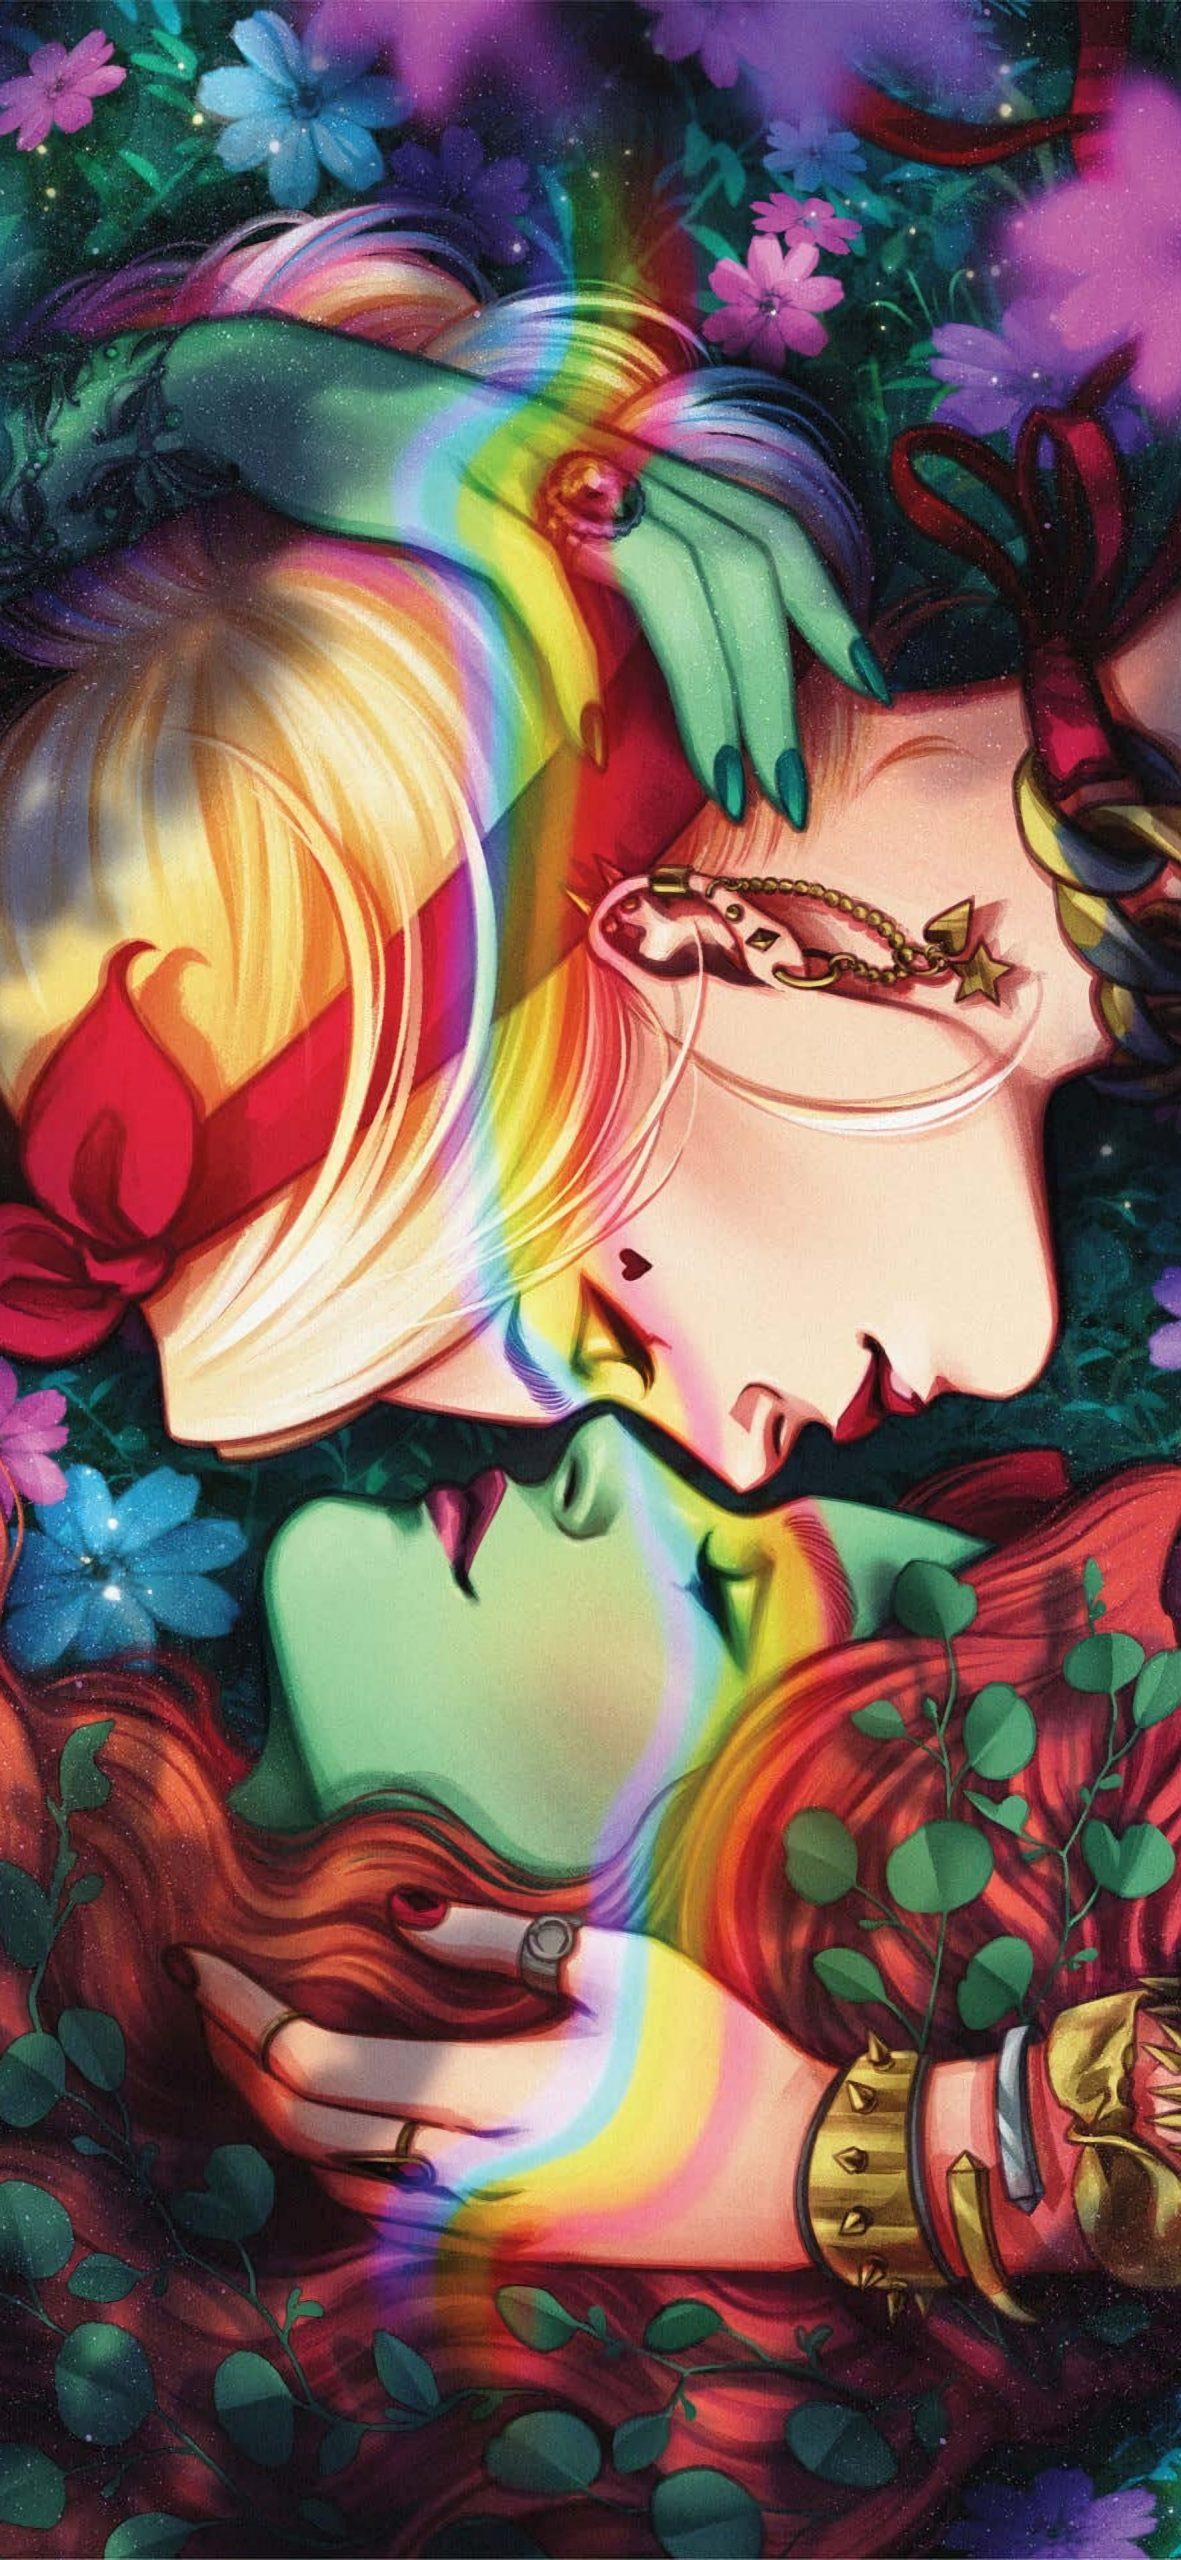 Harley Quinn & Poison Ivy wallpaper [1772x3840]